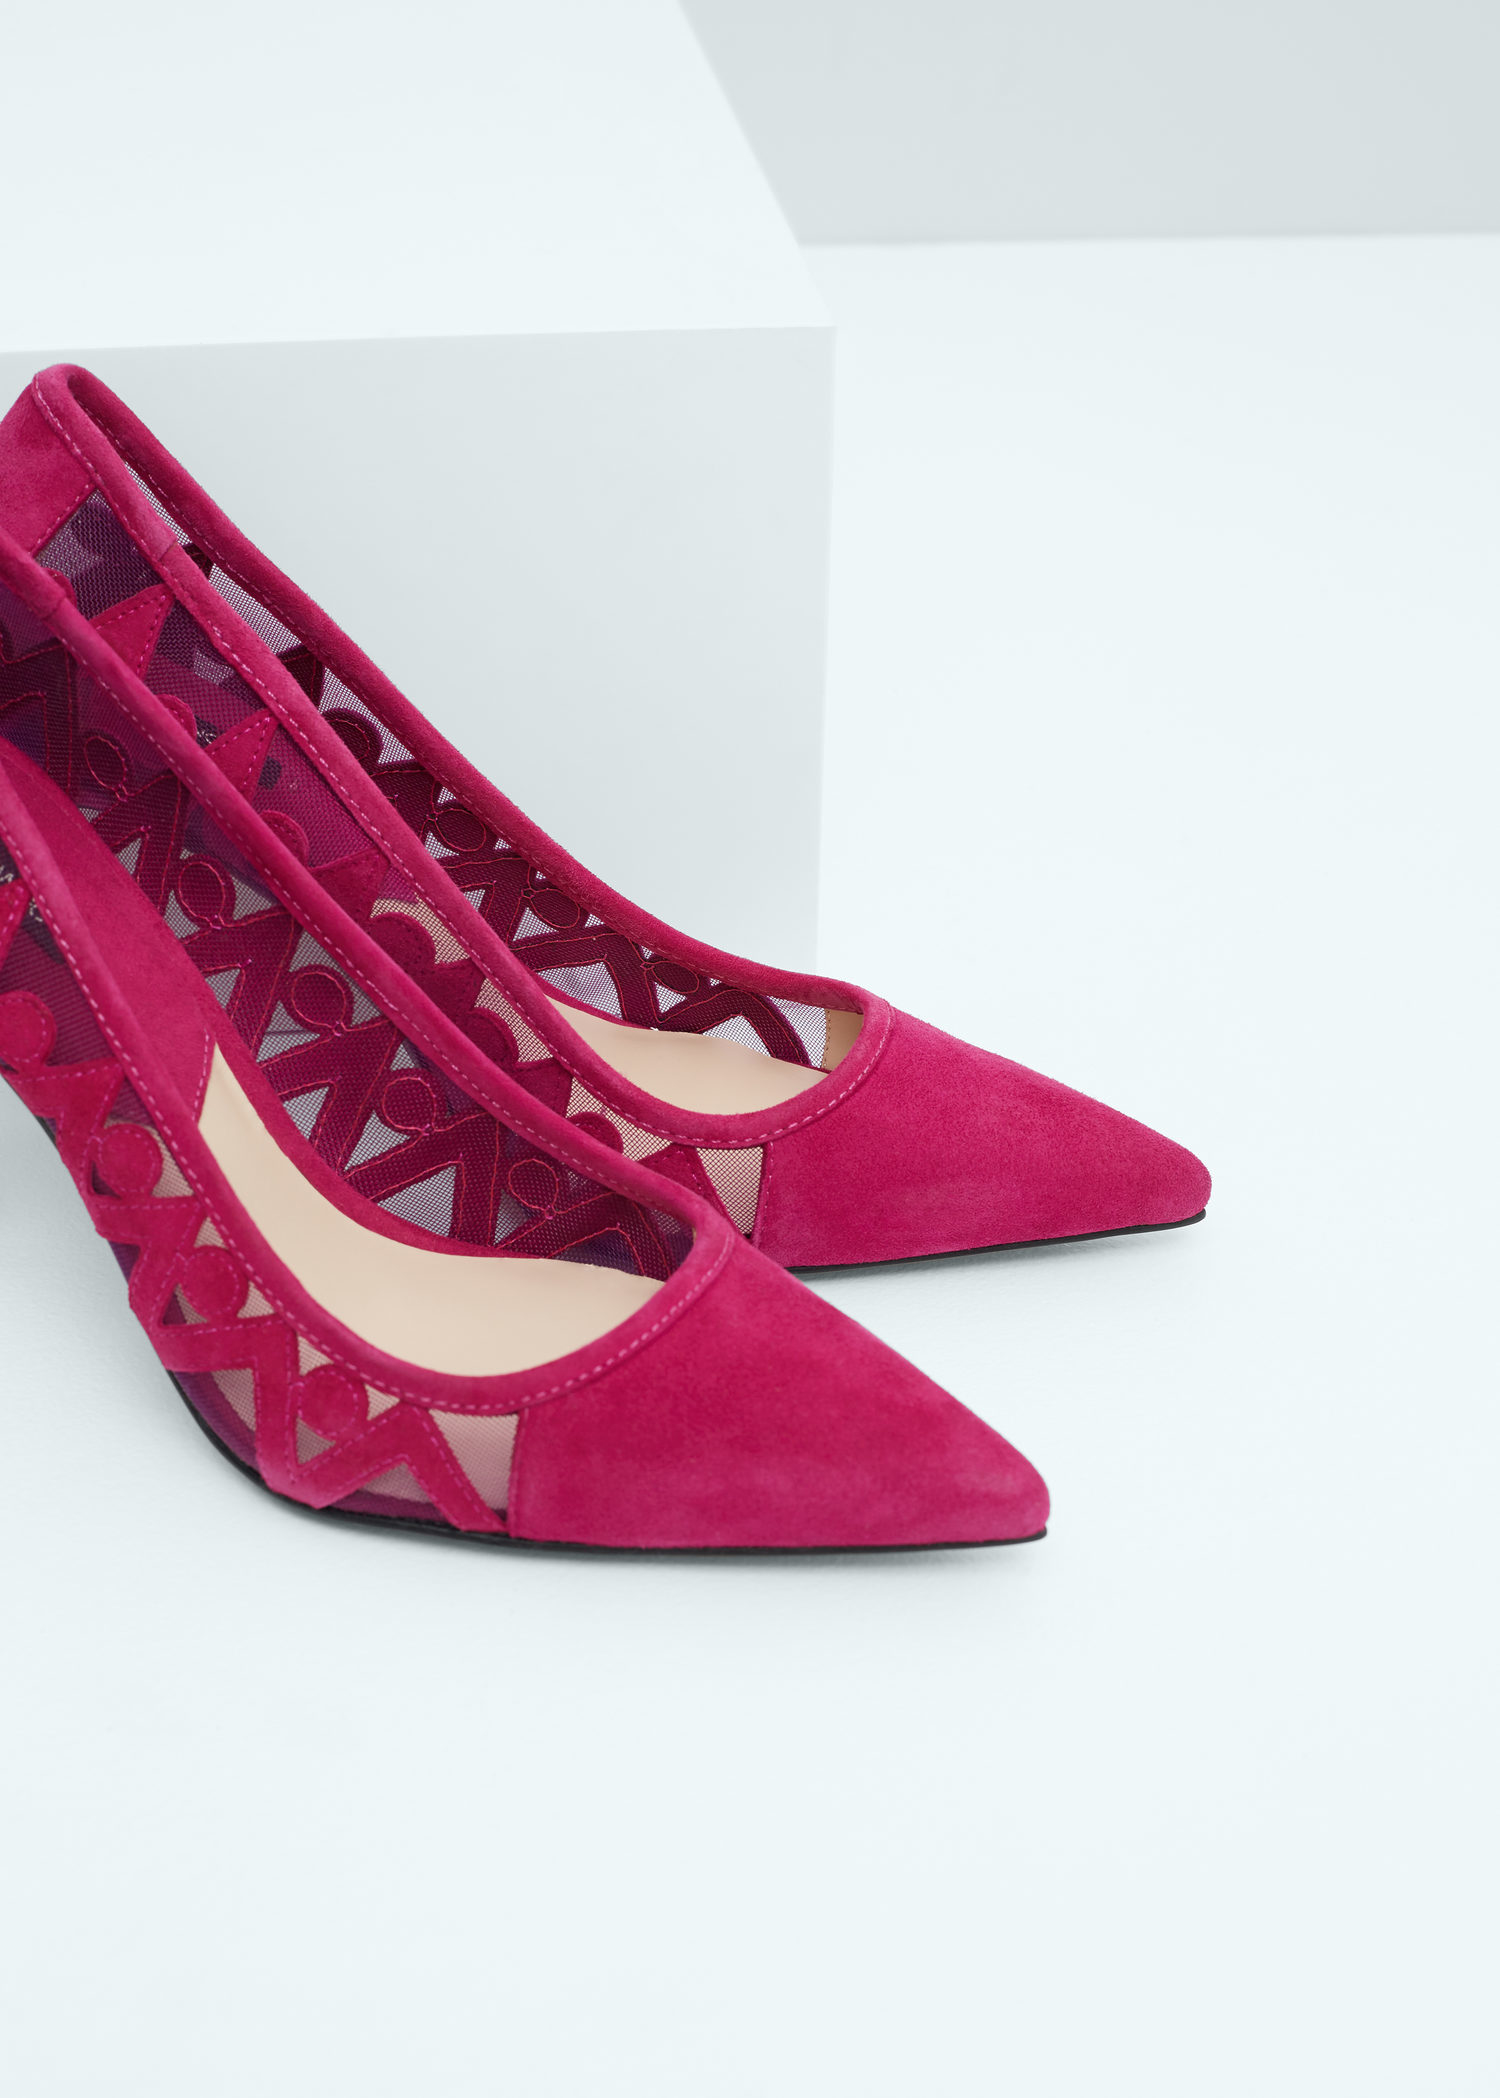 92ec433814 Lyst - Mango Leather Pumps in Pink